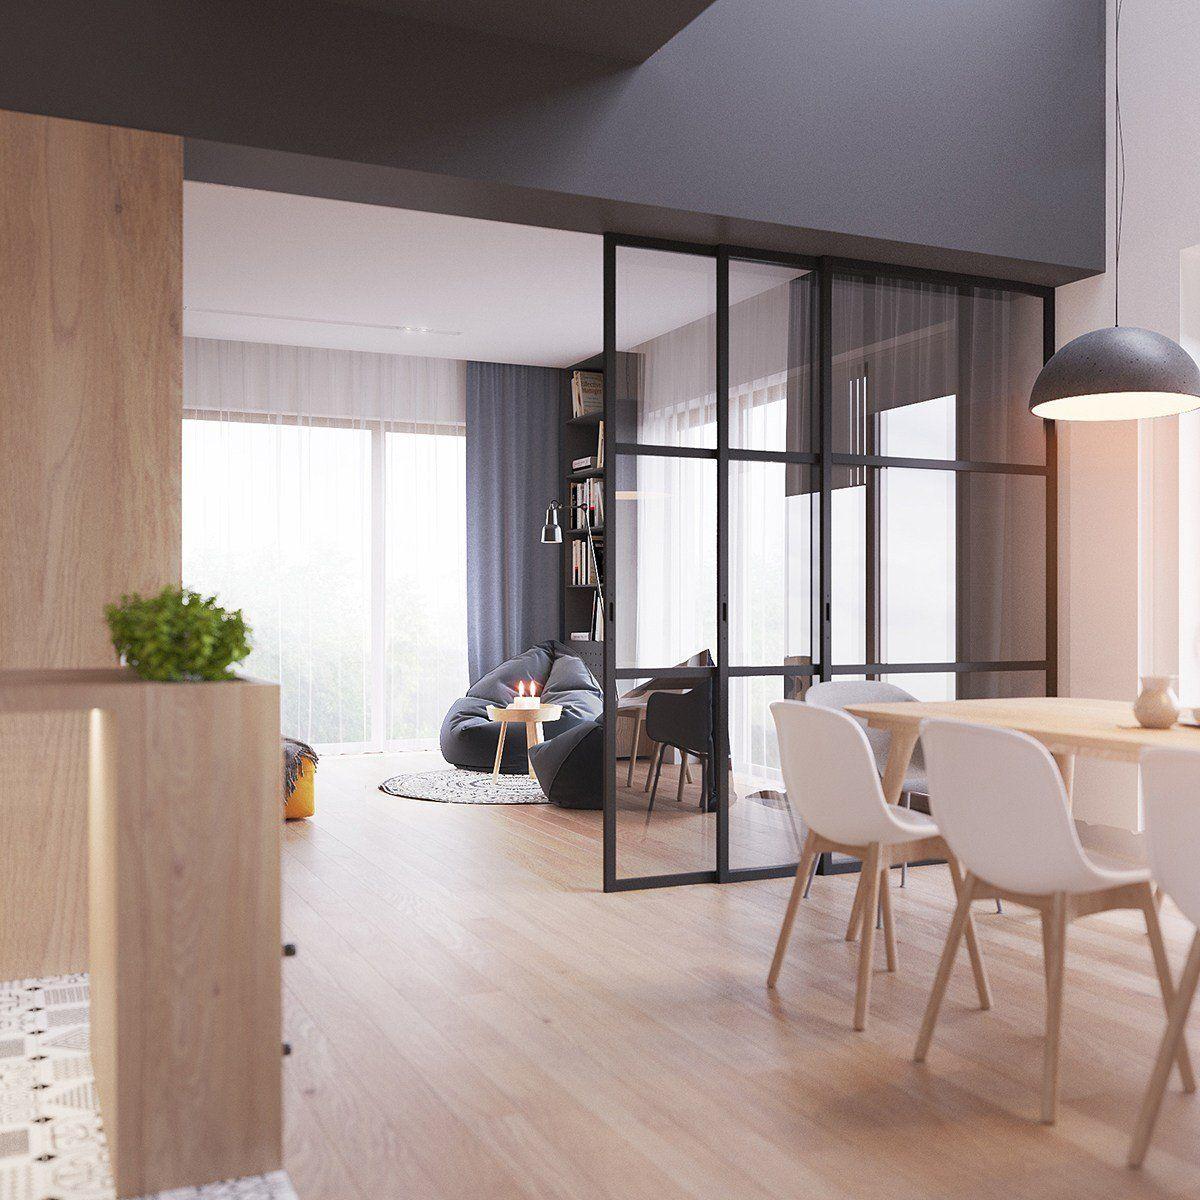 Originale appartamento stile scandinavo moderno design for Salotto casa moderna